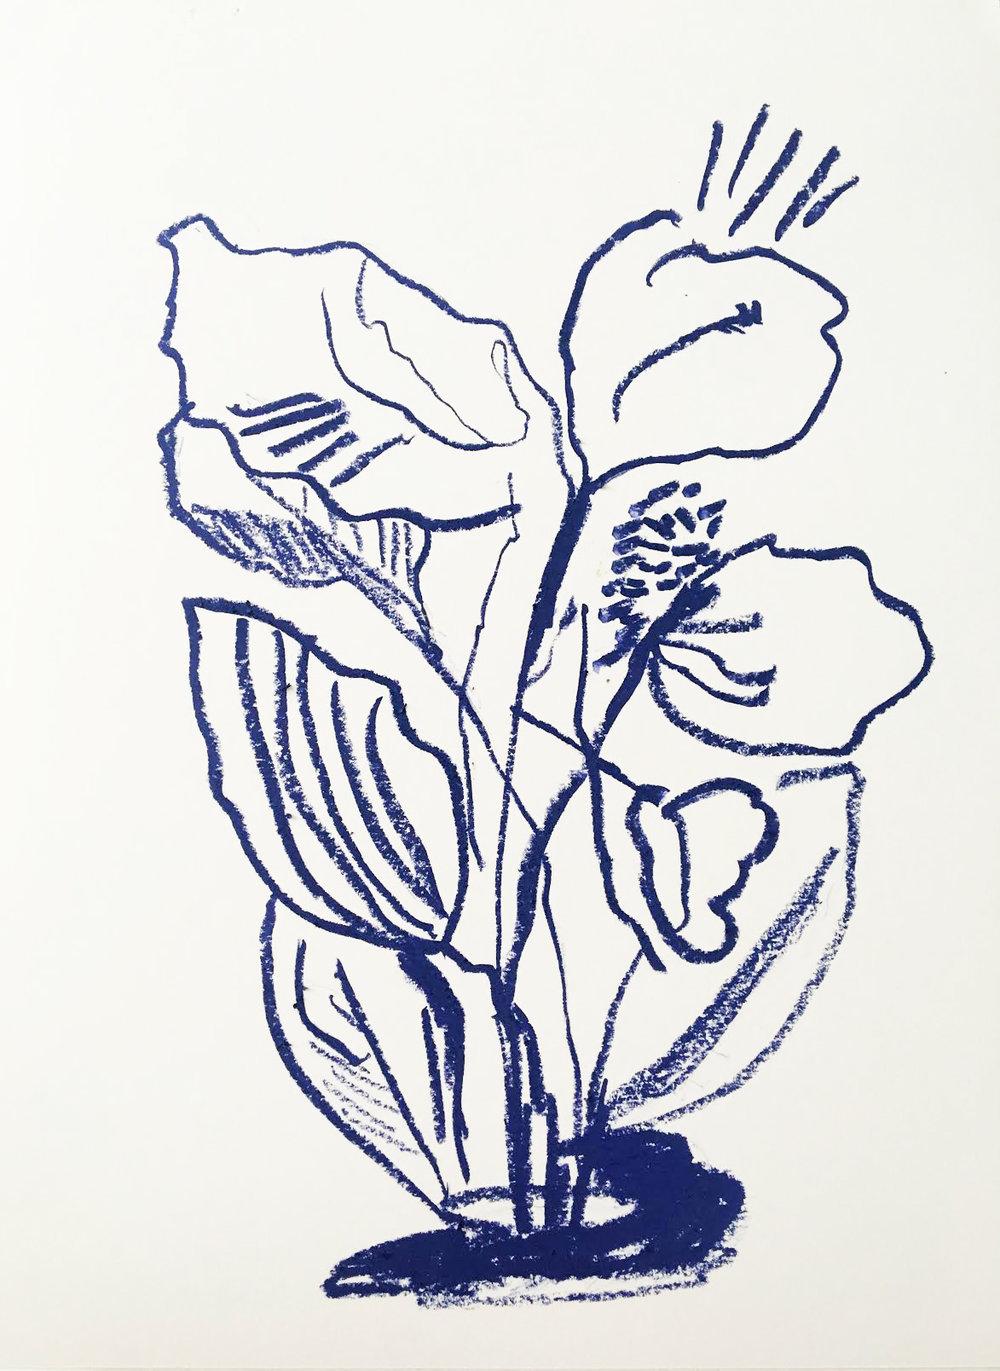 Oil pastel on paper, 2018